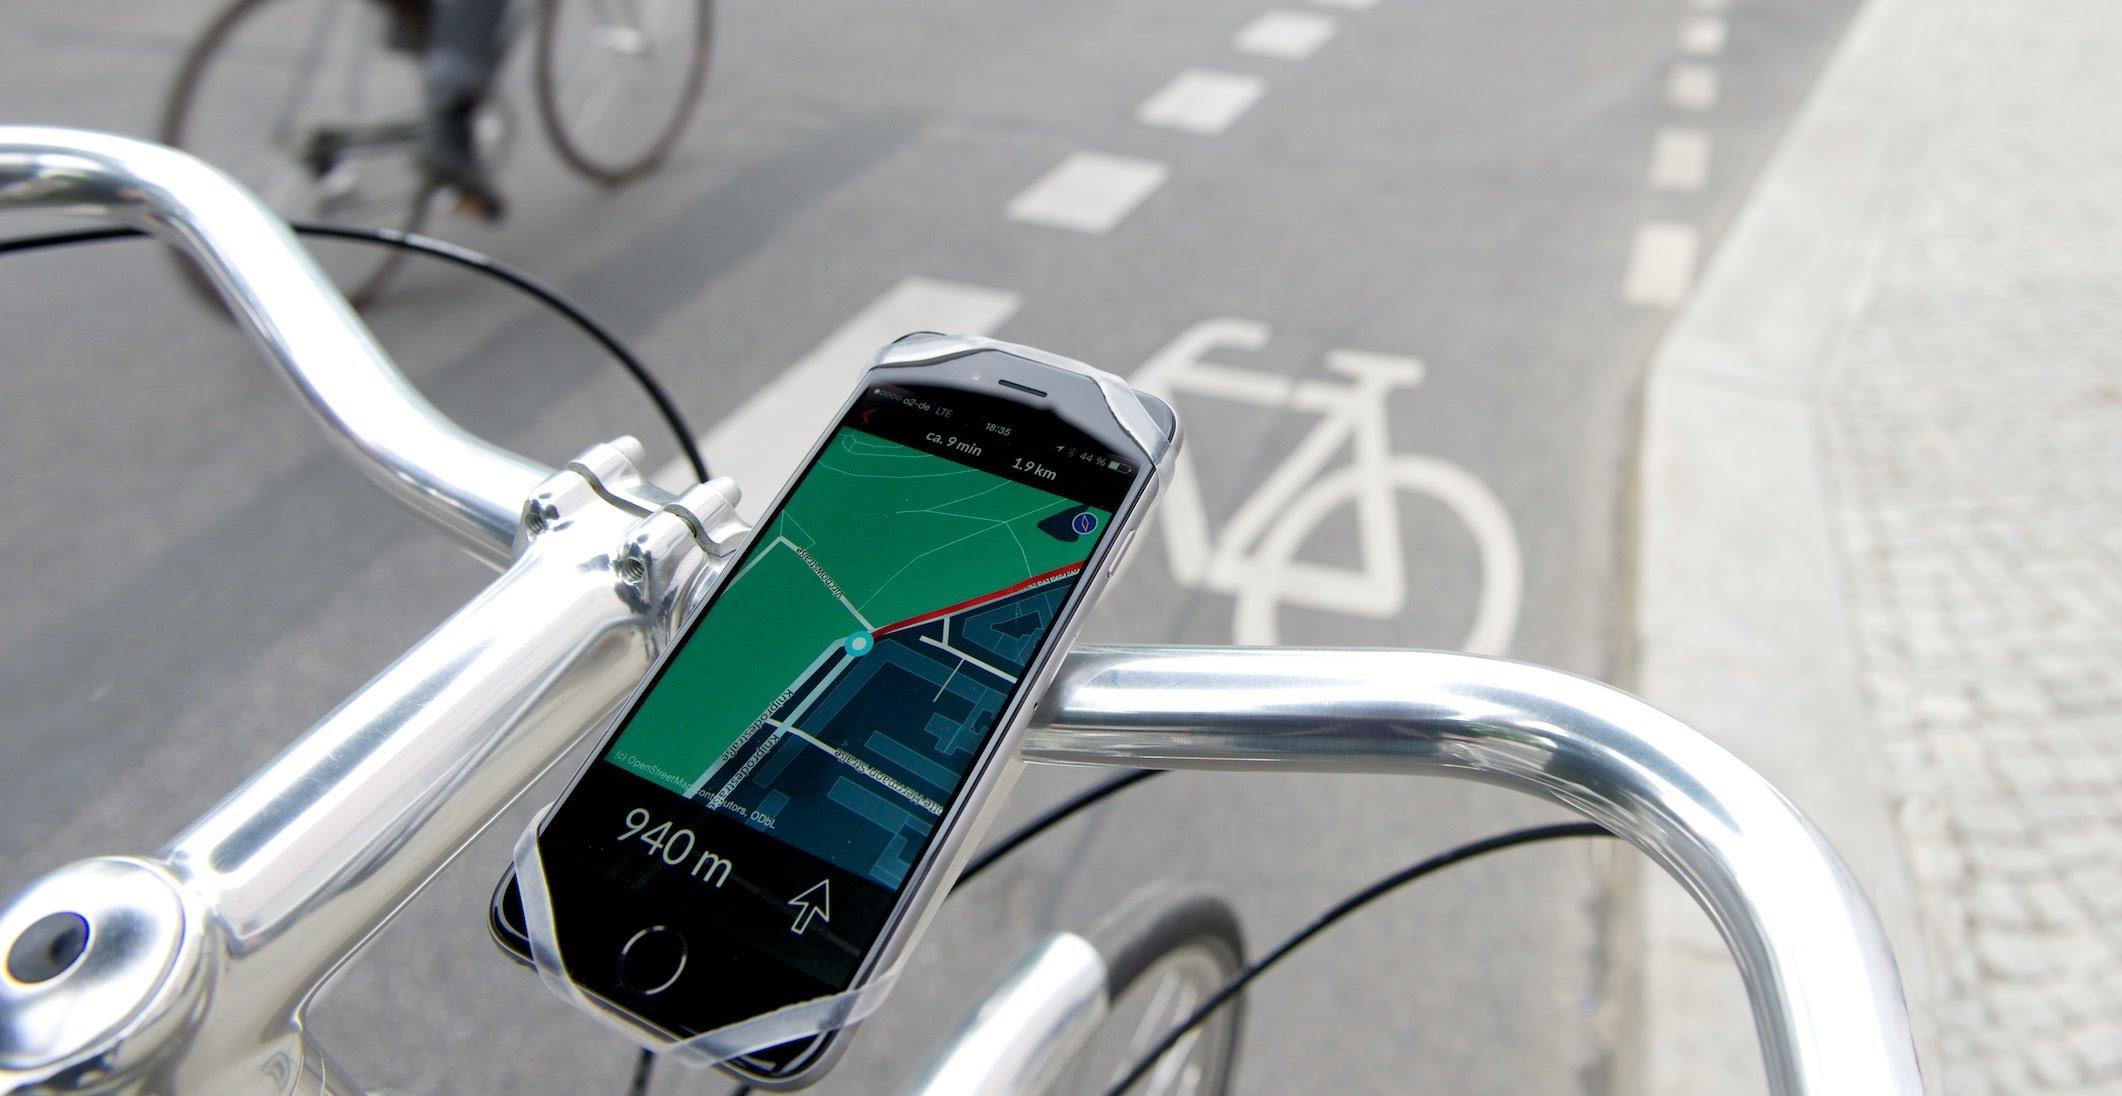 mobilita bicicletta smarphone app